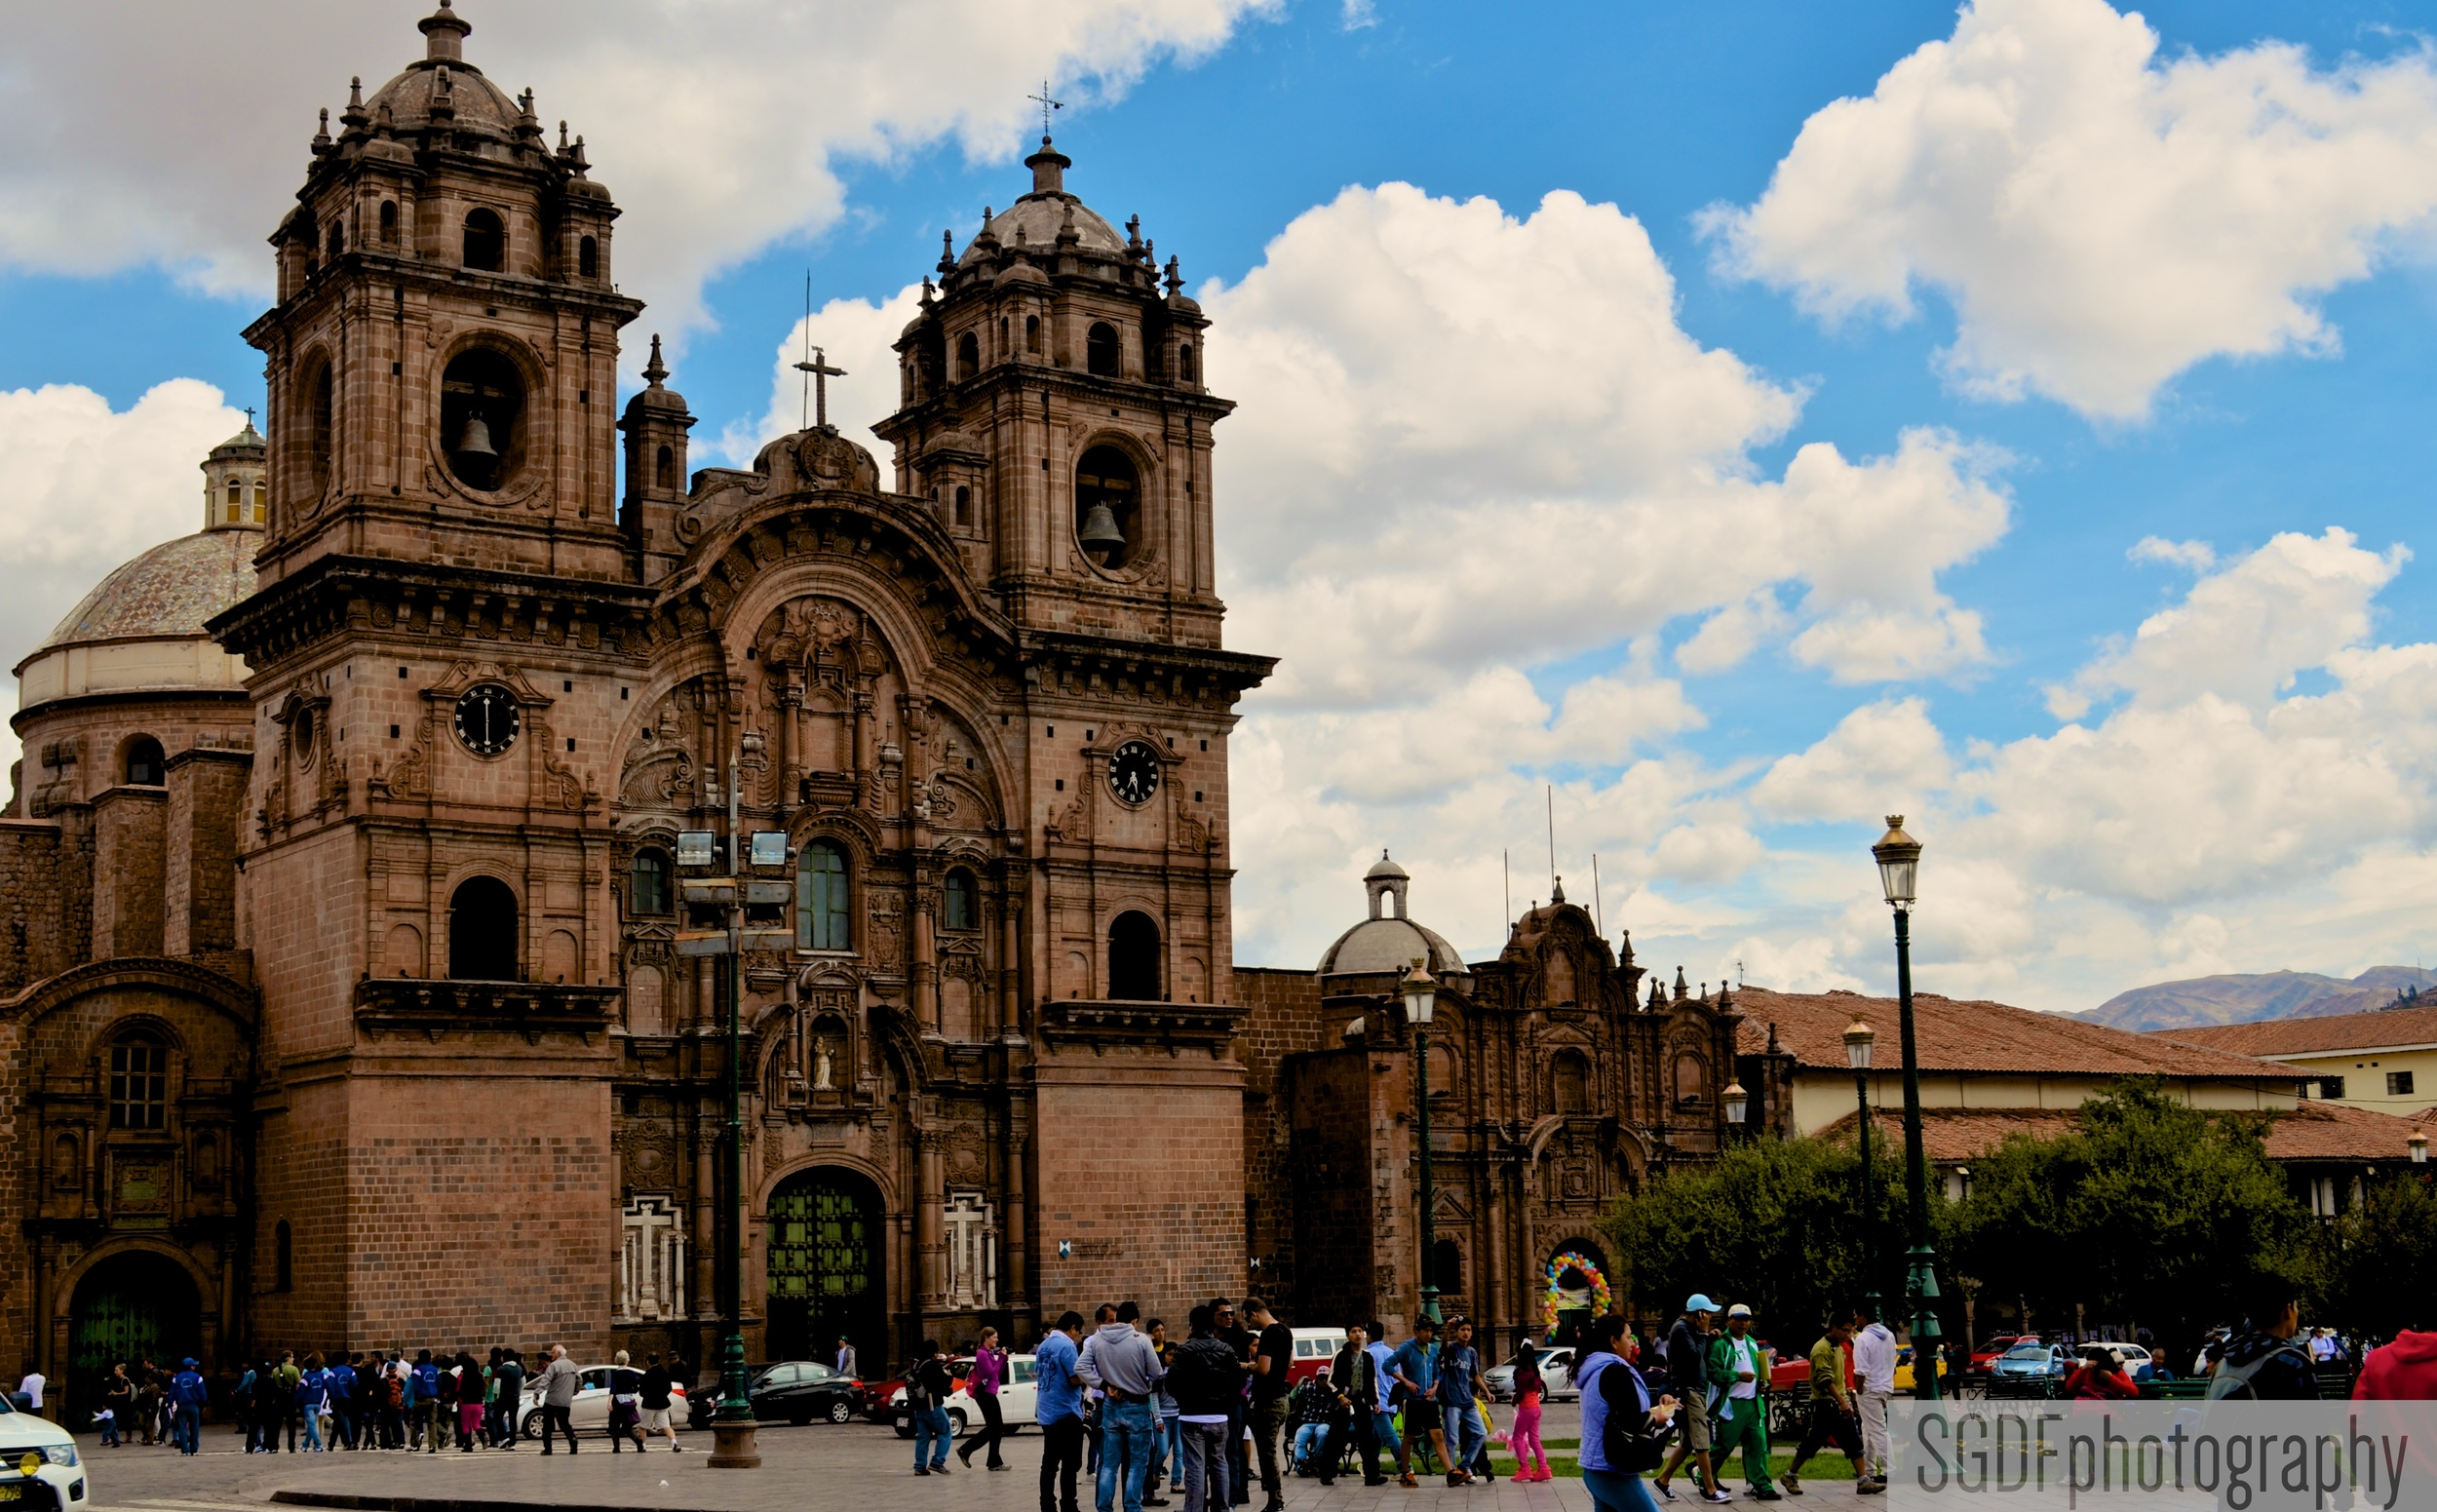 Iglesia de la Compania de Jesus, Plaza de Armas, Cusco, Peru (W).jpg